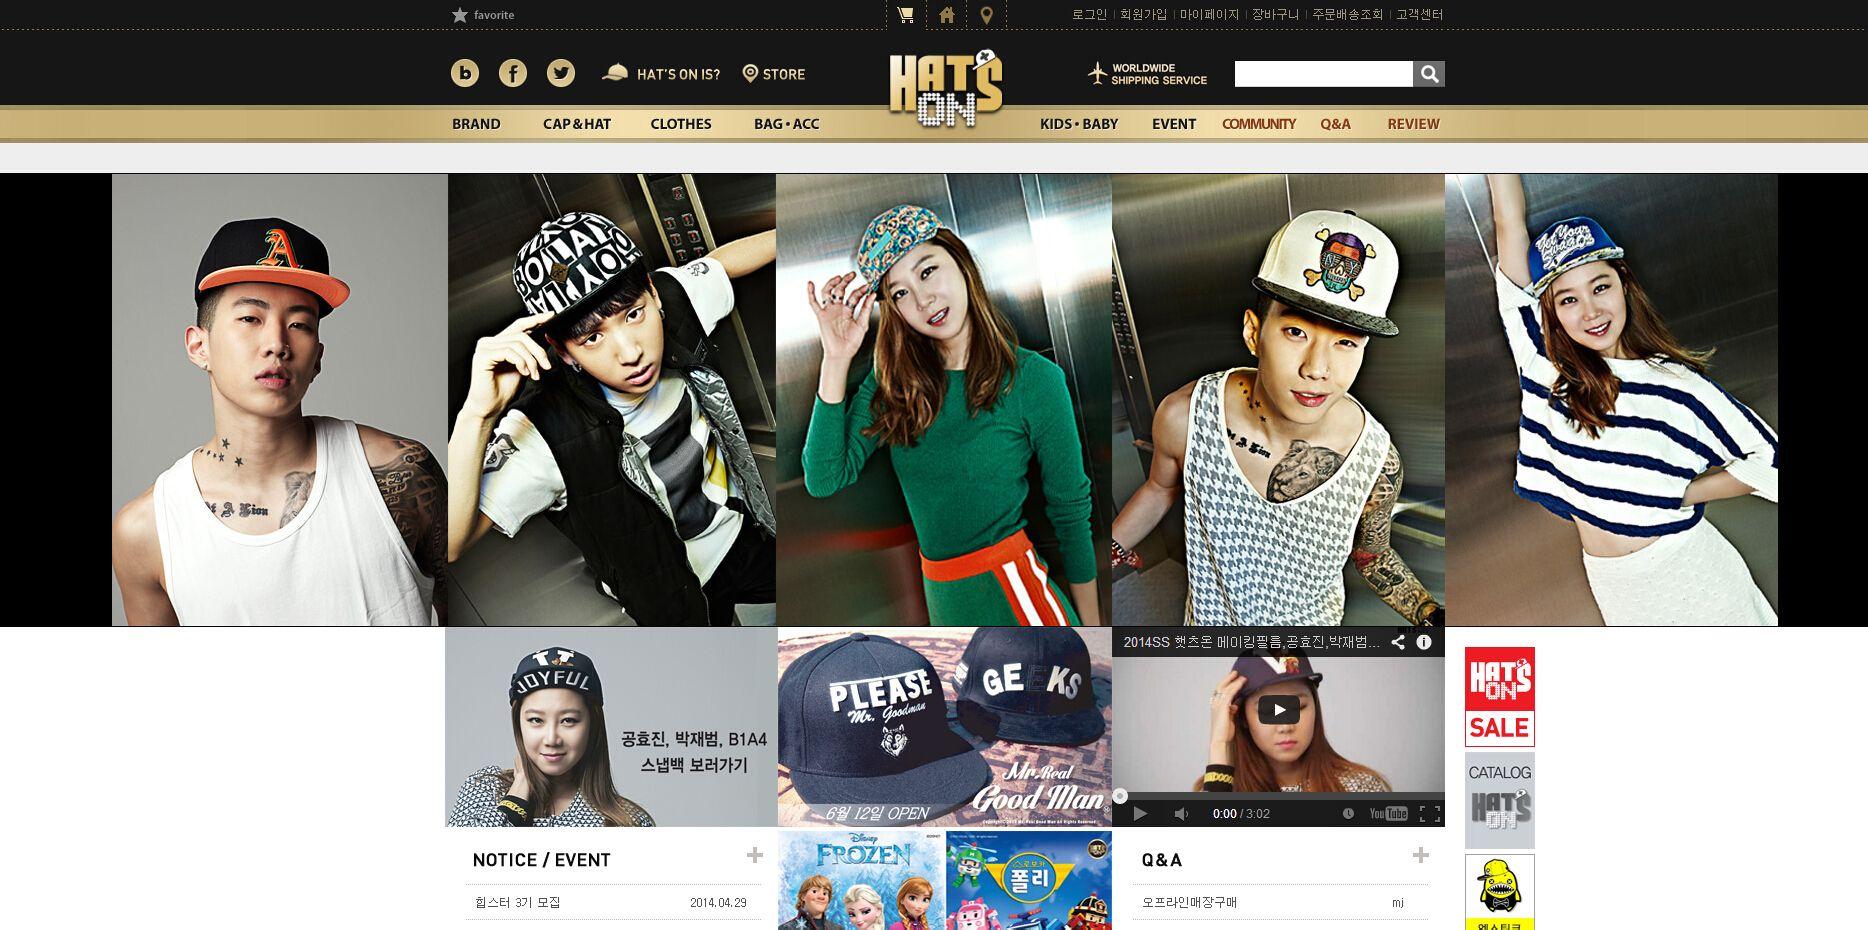 http://h.hiphotos.baidu.com/zhidao/pic/item/5ab5c9ea15ce36d3b23a46e138f33a87e950b121.jpg_请问hatson的韩国官网是什么?_百度知道